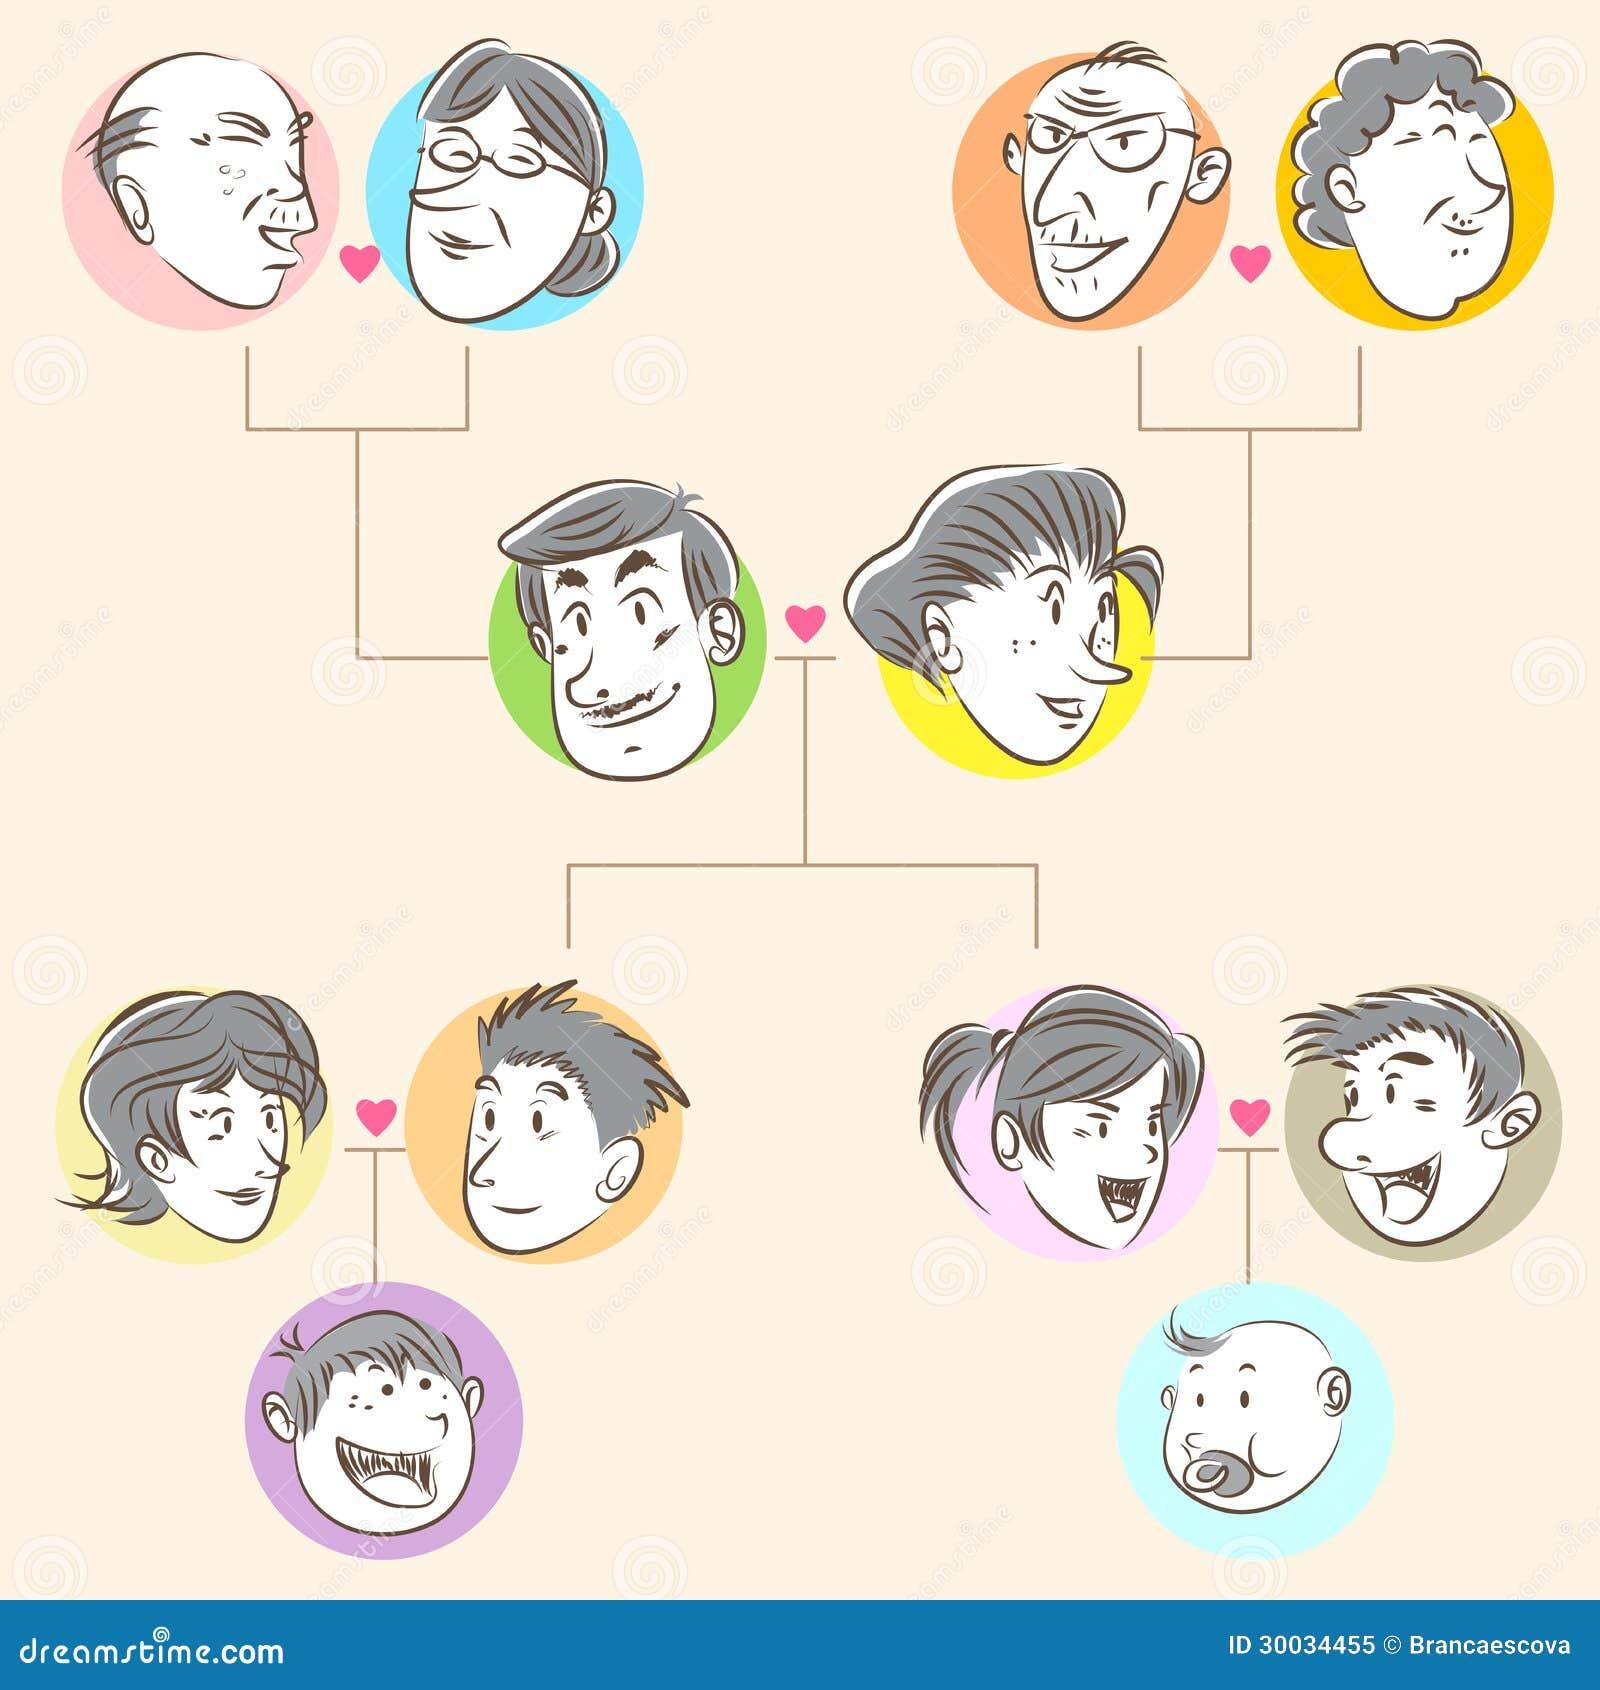 Family Tree Design Free